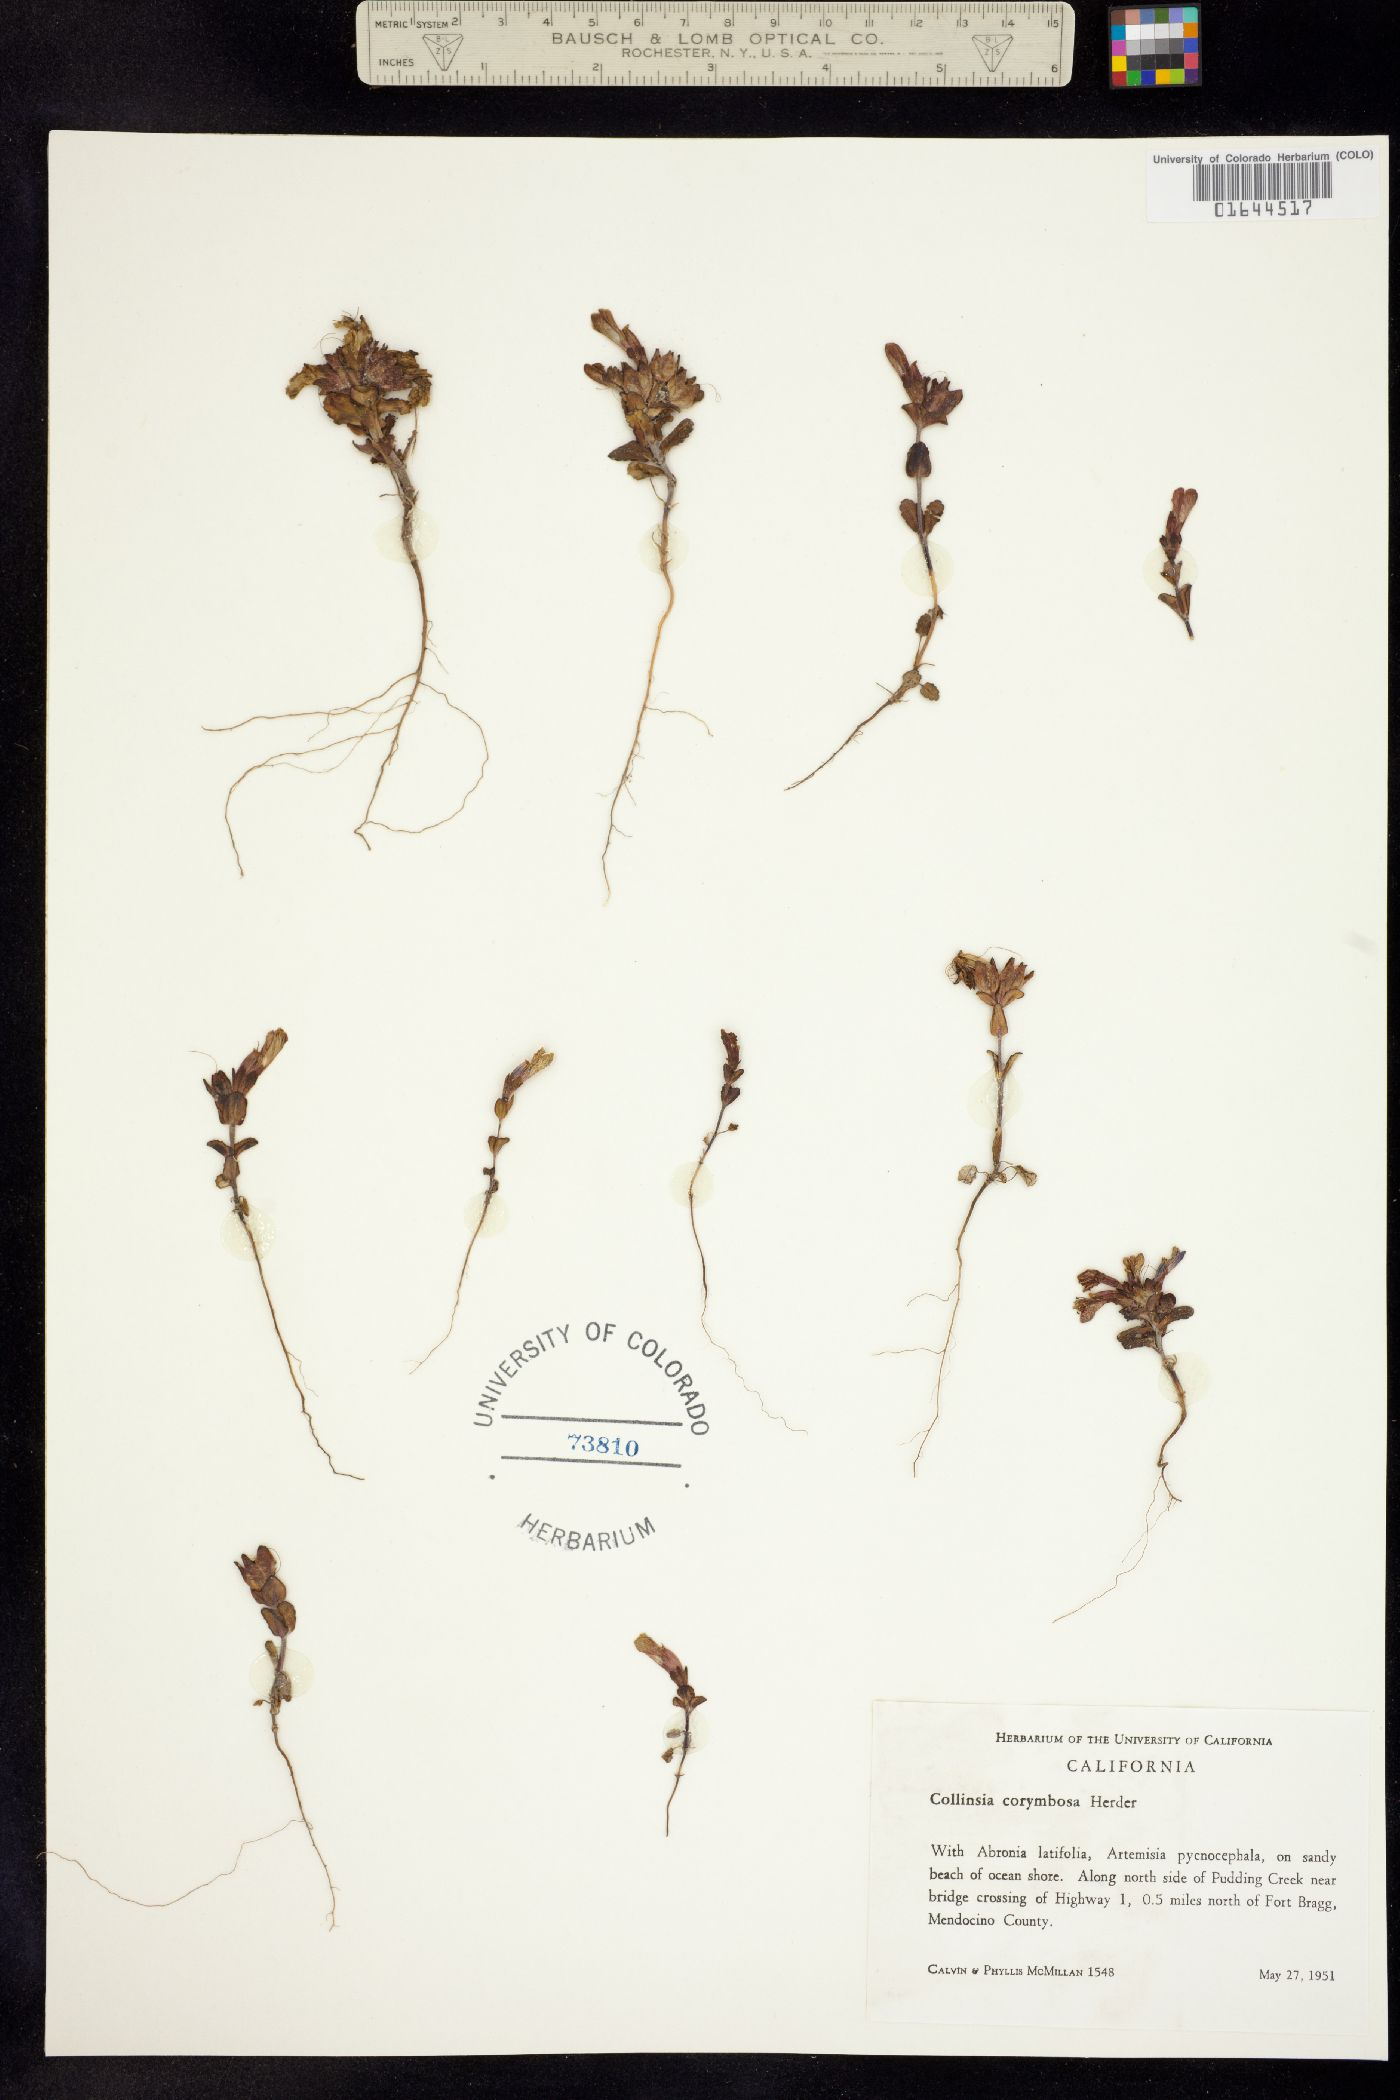 Collinsia corymbosa image